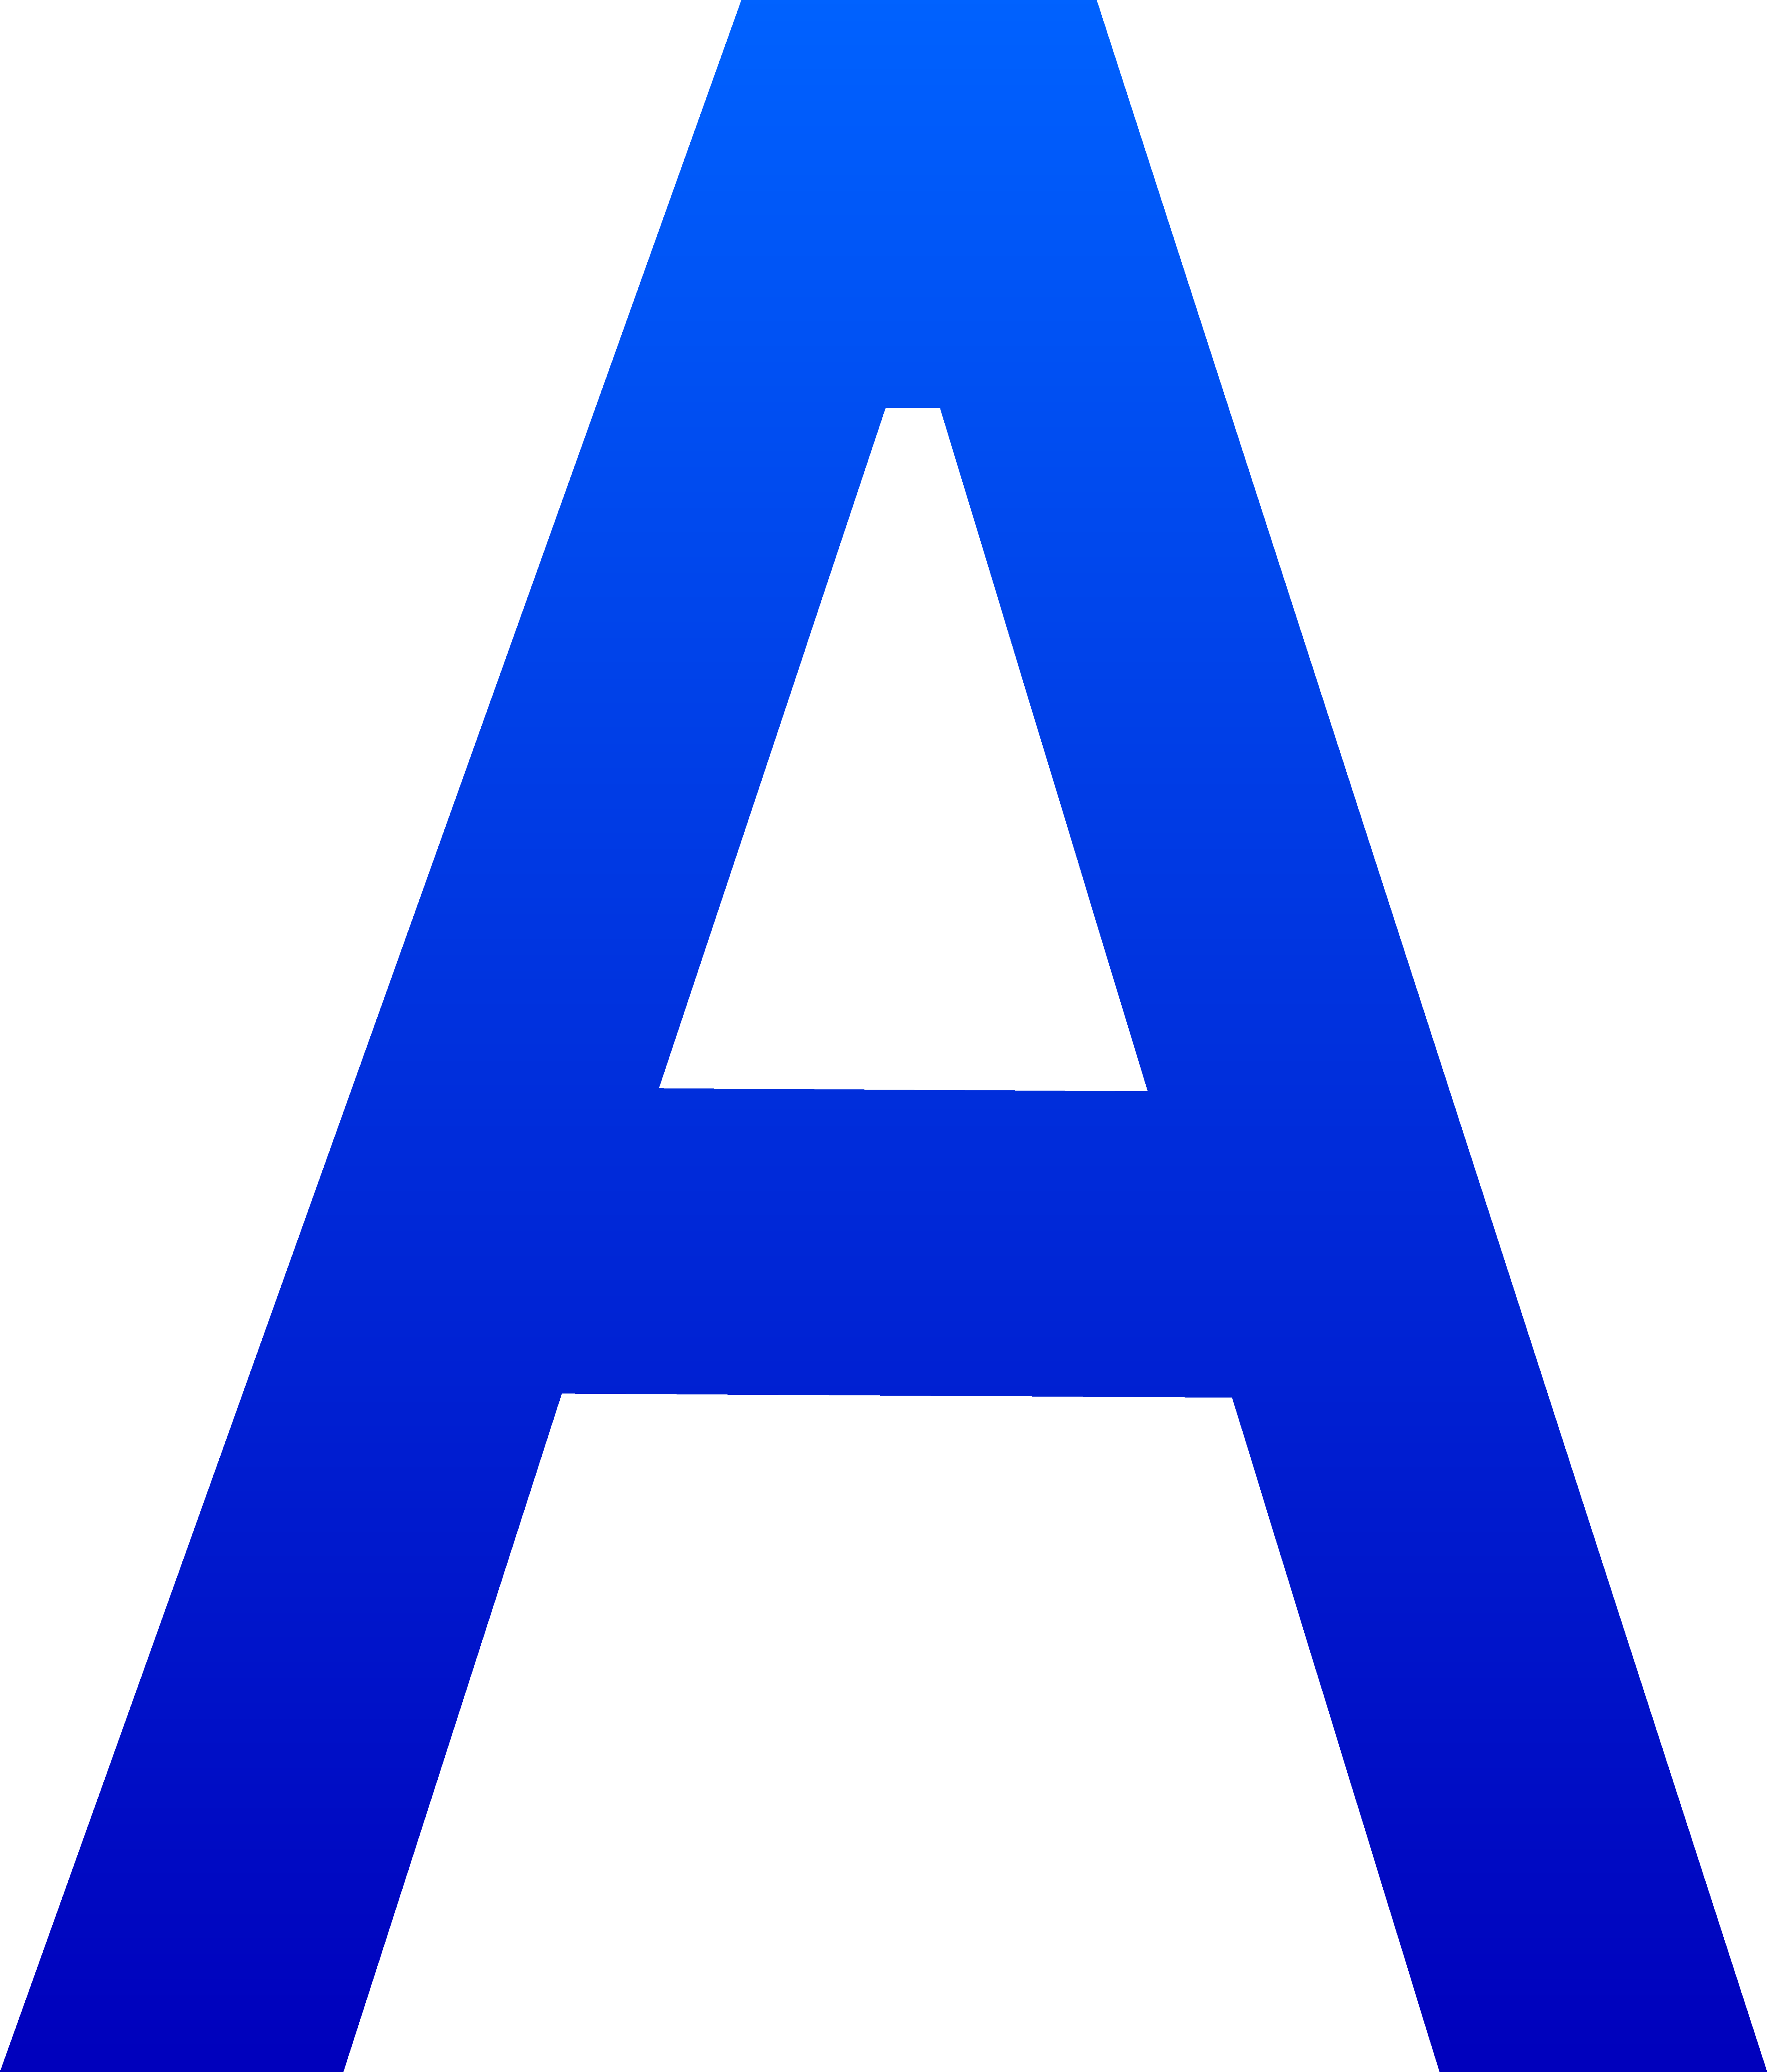 Free Blue Gingham Digi Scrapbook Alphabet with Flower   Abecedario,  Cuadros, Cuadros azules